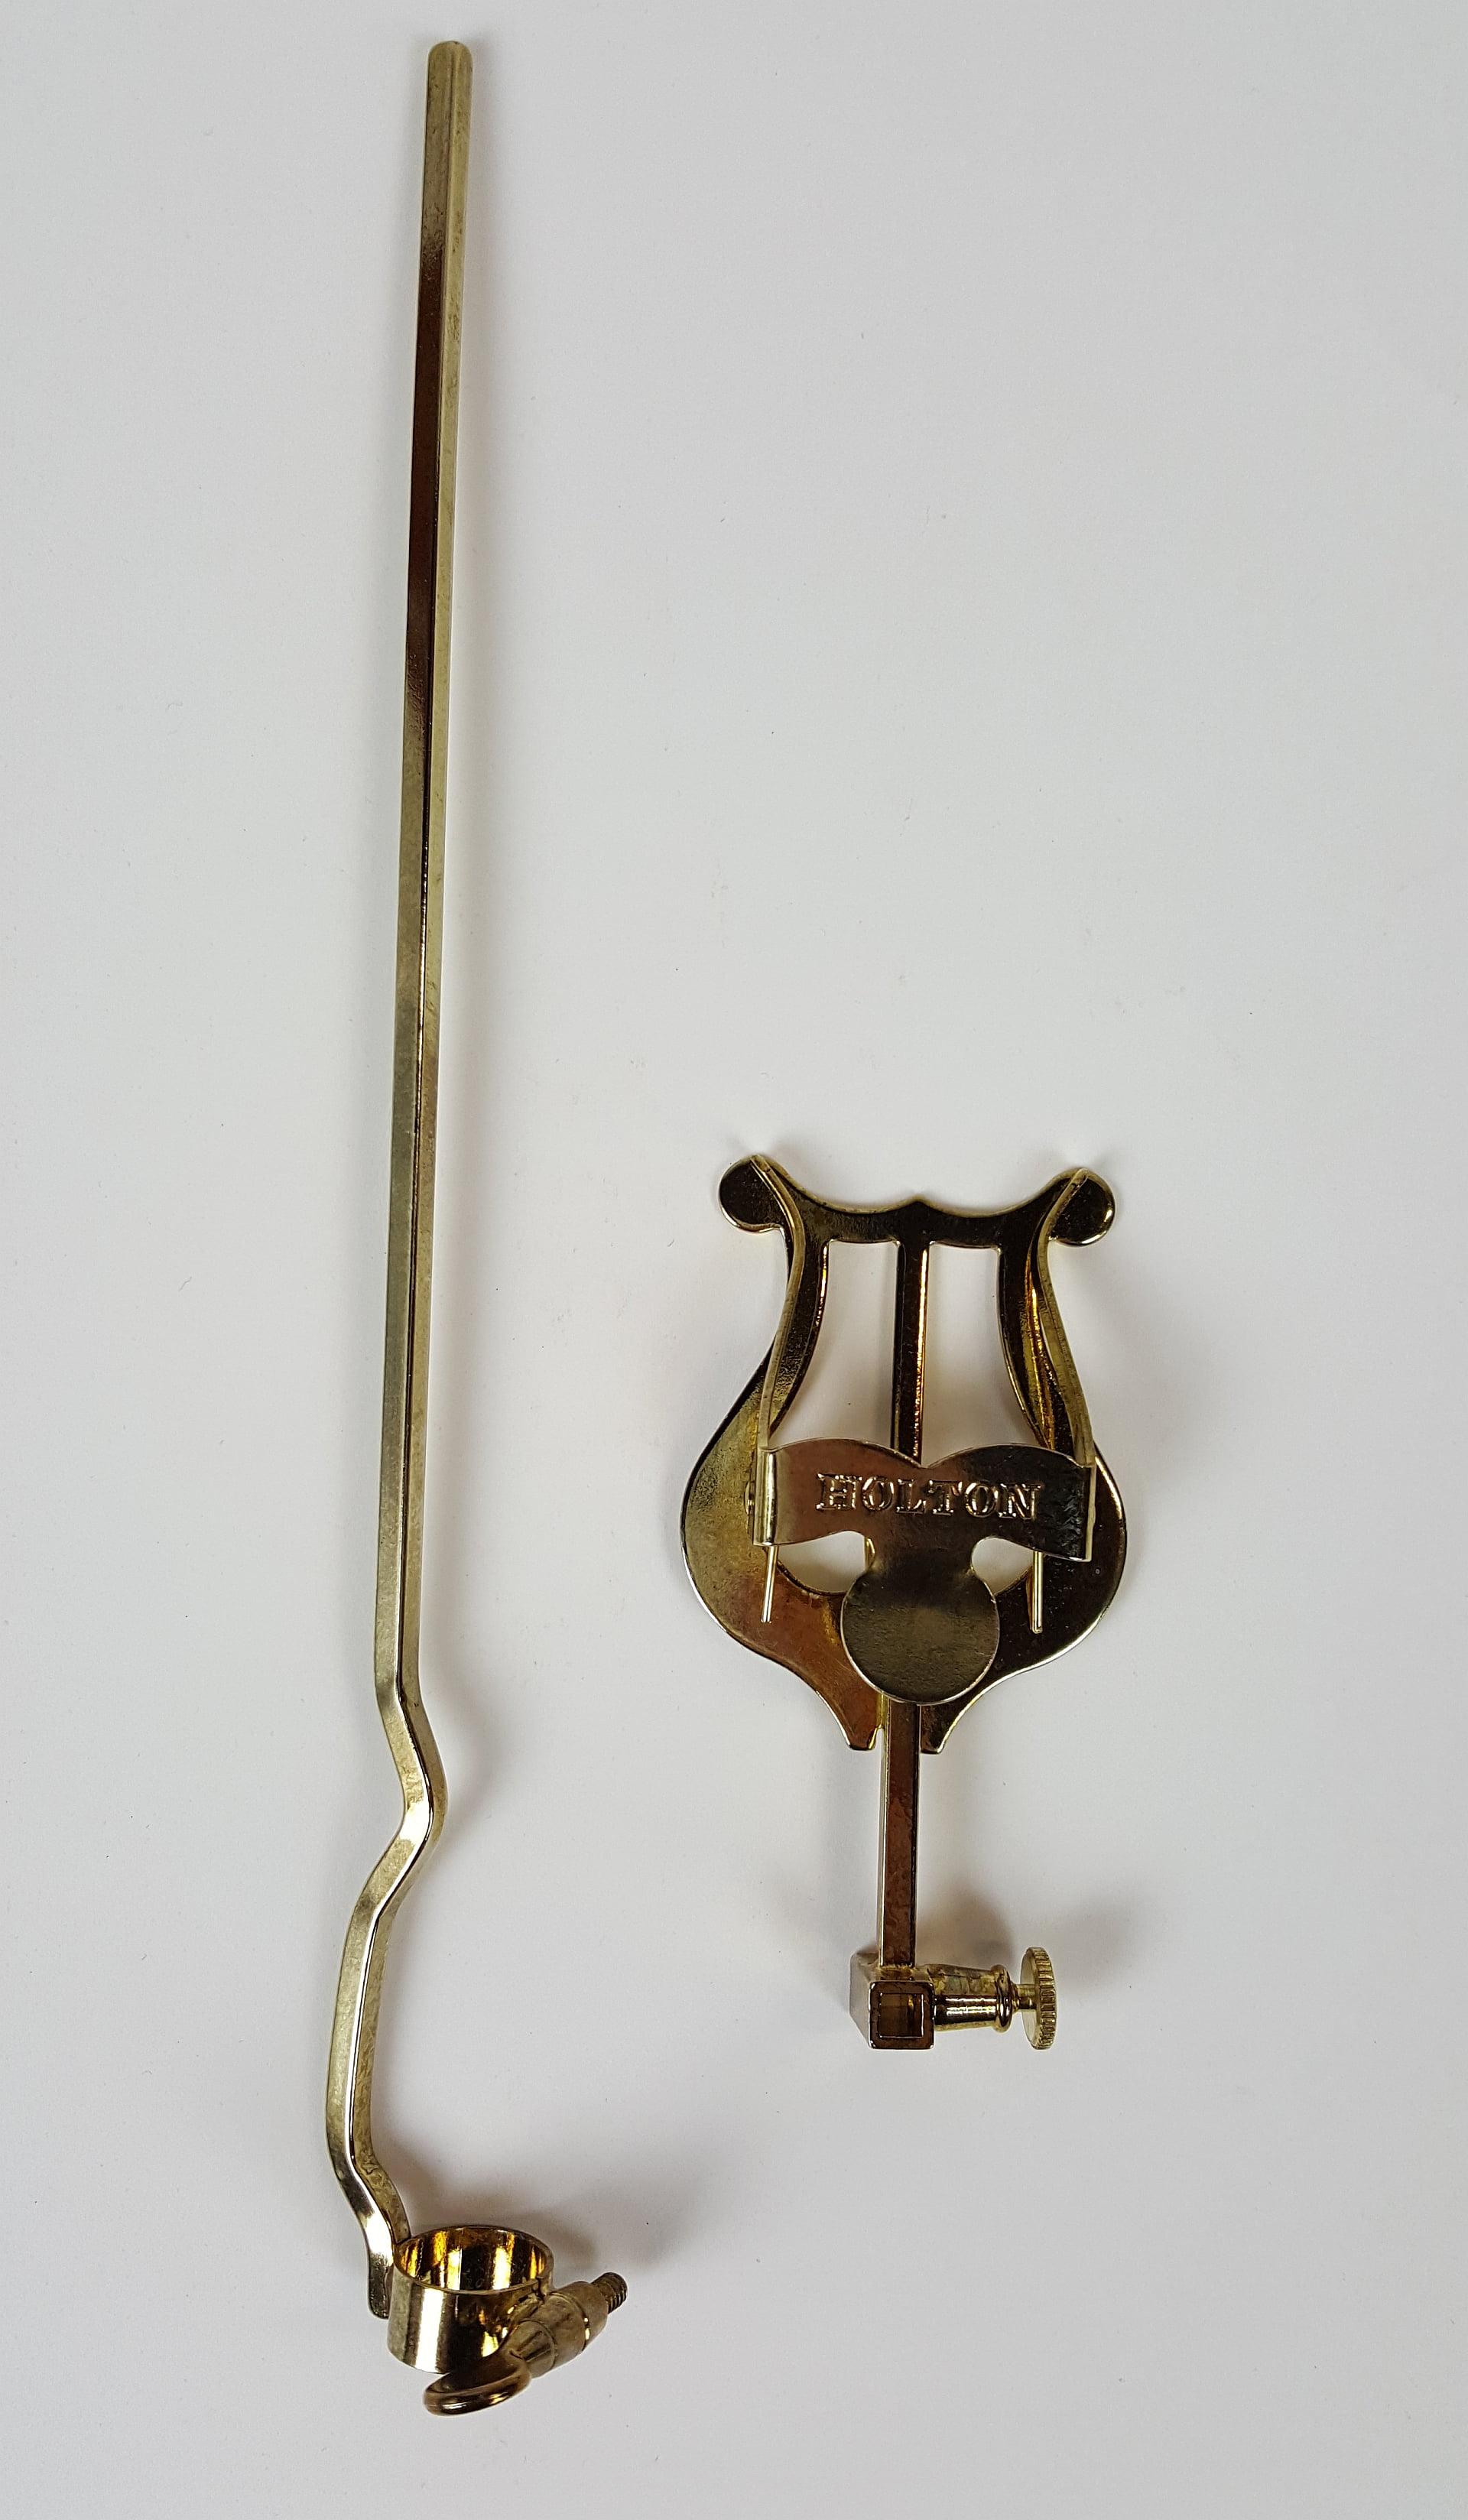 Holton 3060B Tenor Trombone Lyre, Brass by Holton